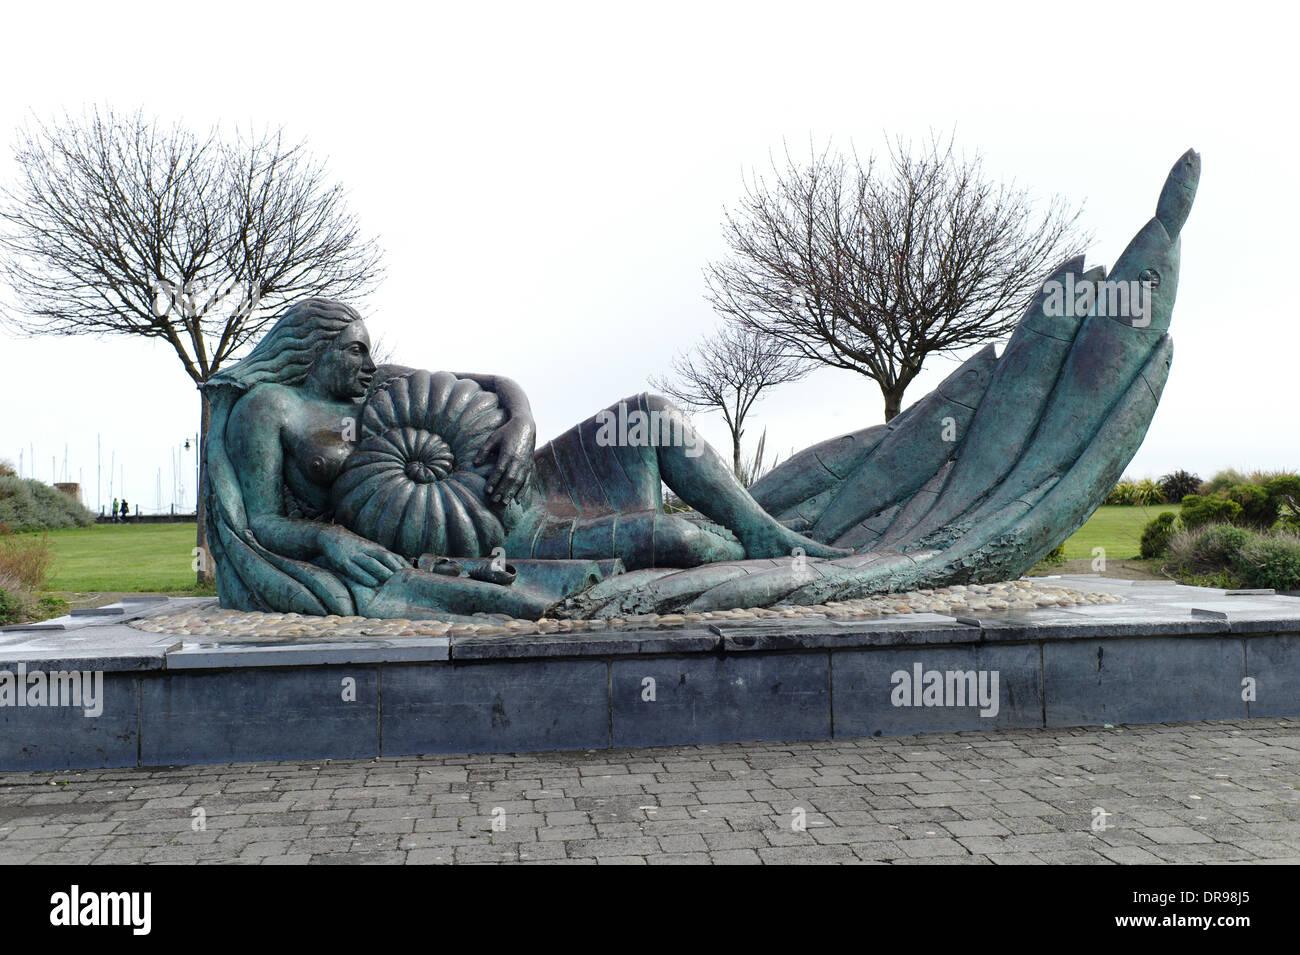 The Mermaid bronze sculpture at Malahide, Dublin, Ireland - Stock Image